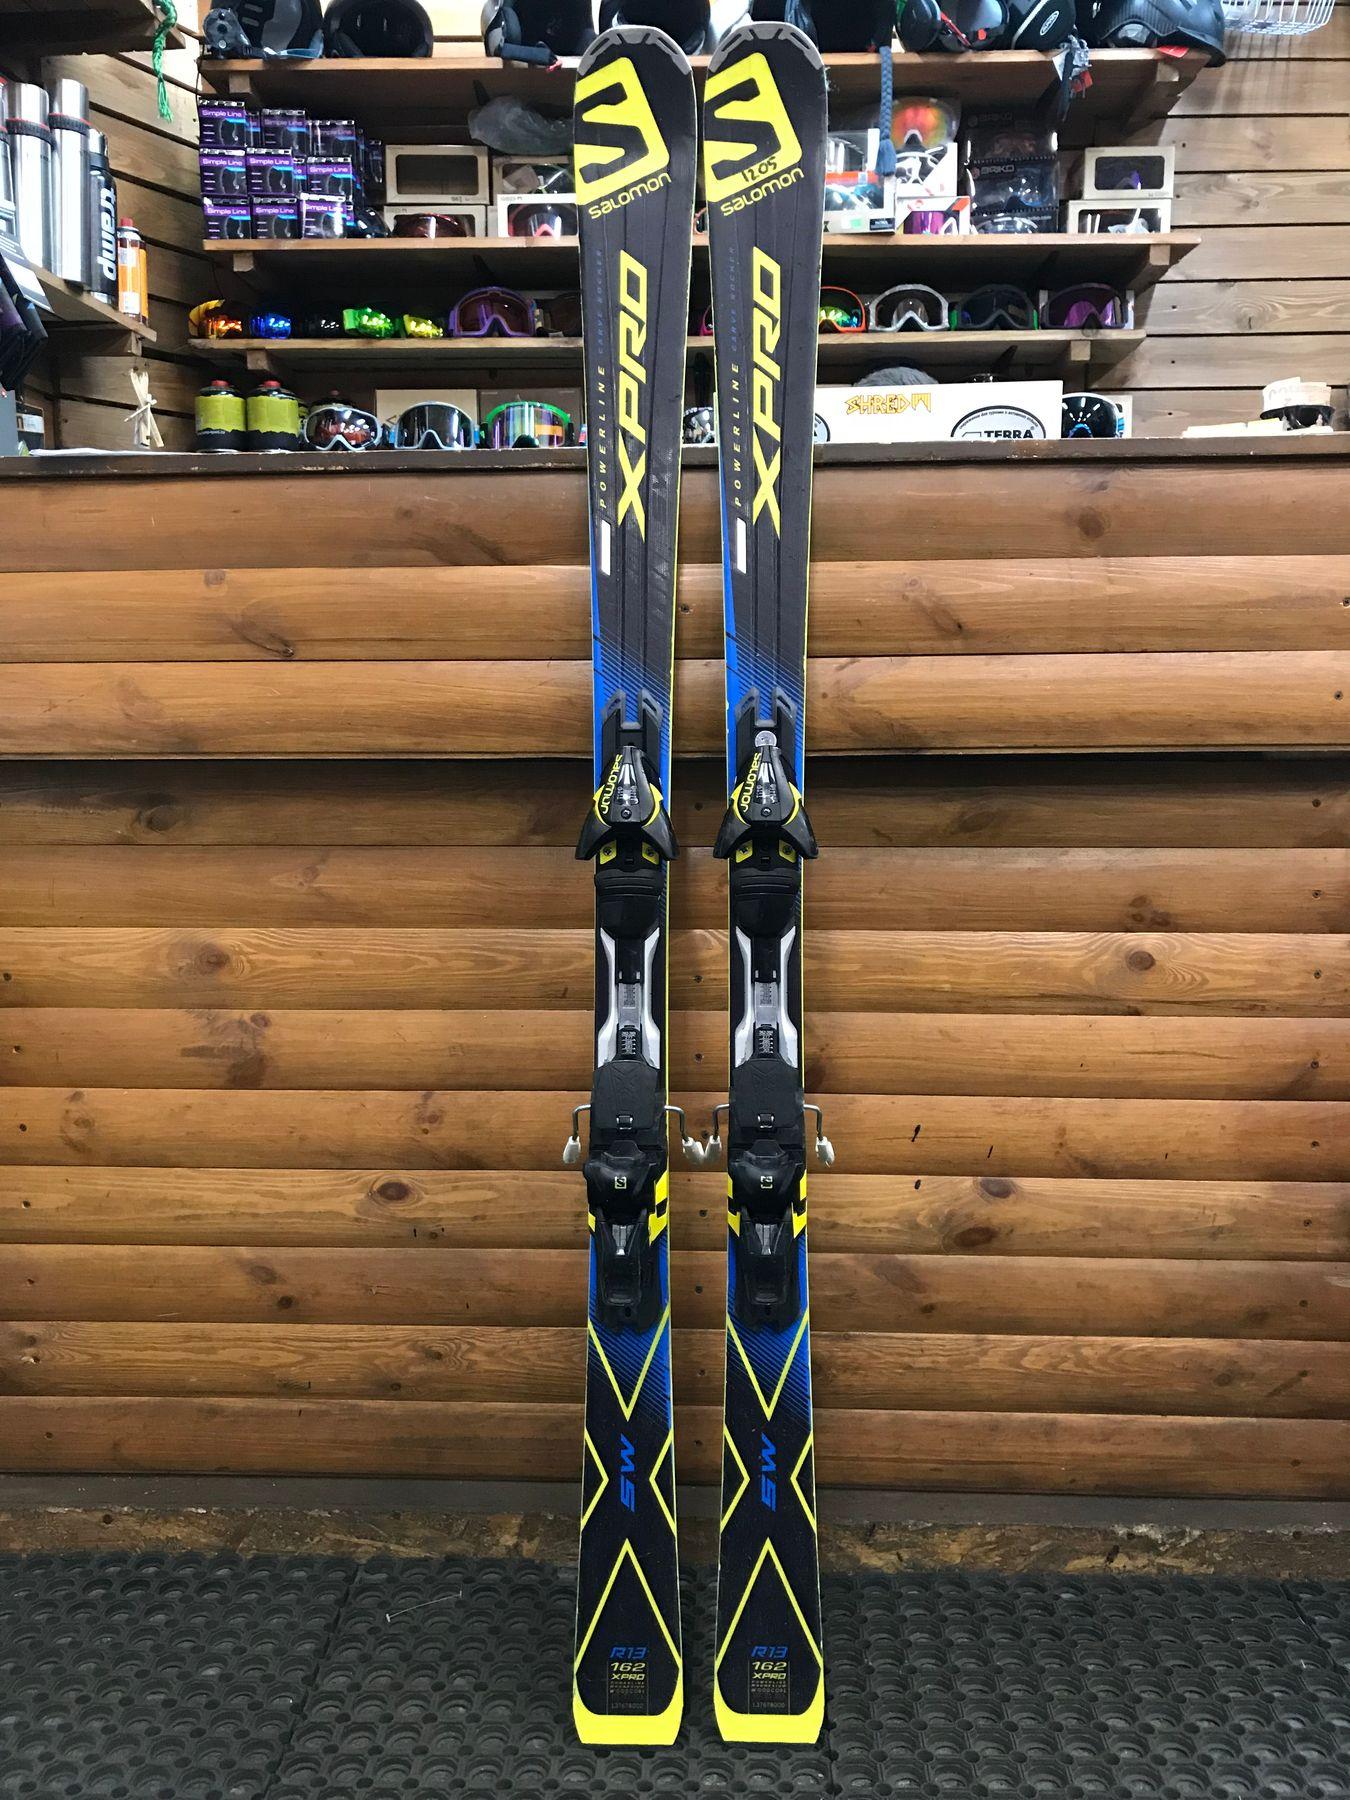 ff71517cacc9 Лыжи б у Salomon X Pro 162 cm.,цена, купить Лыжи б у Salomon X Pro 162 cm.,  продажа, цена, описание, с ...